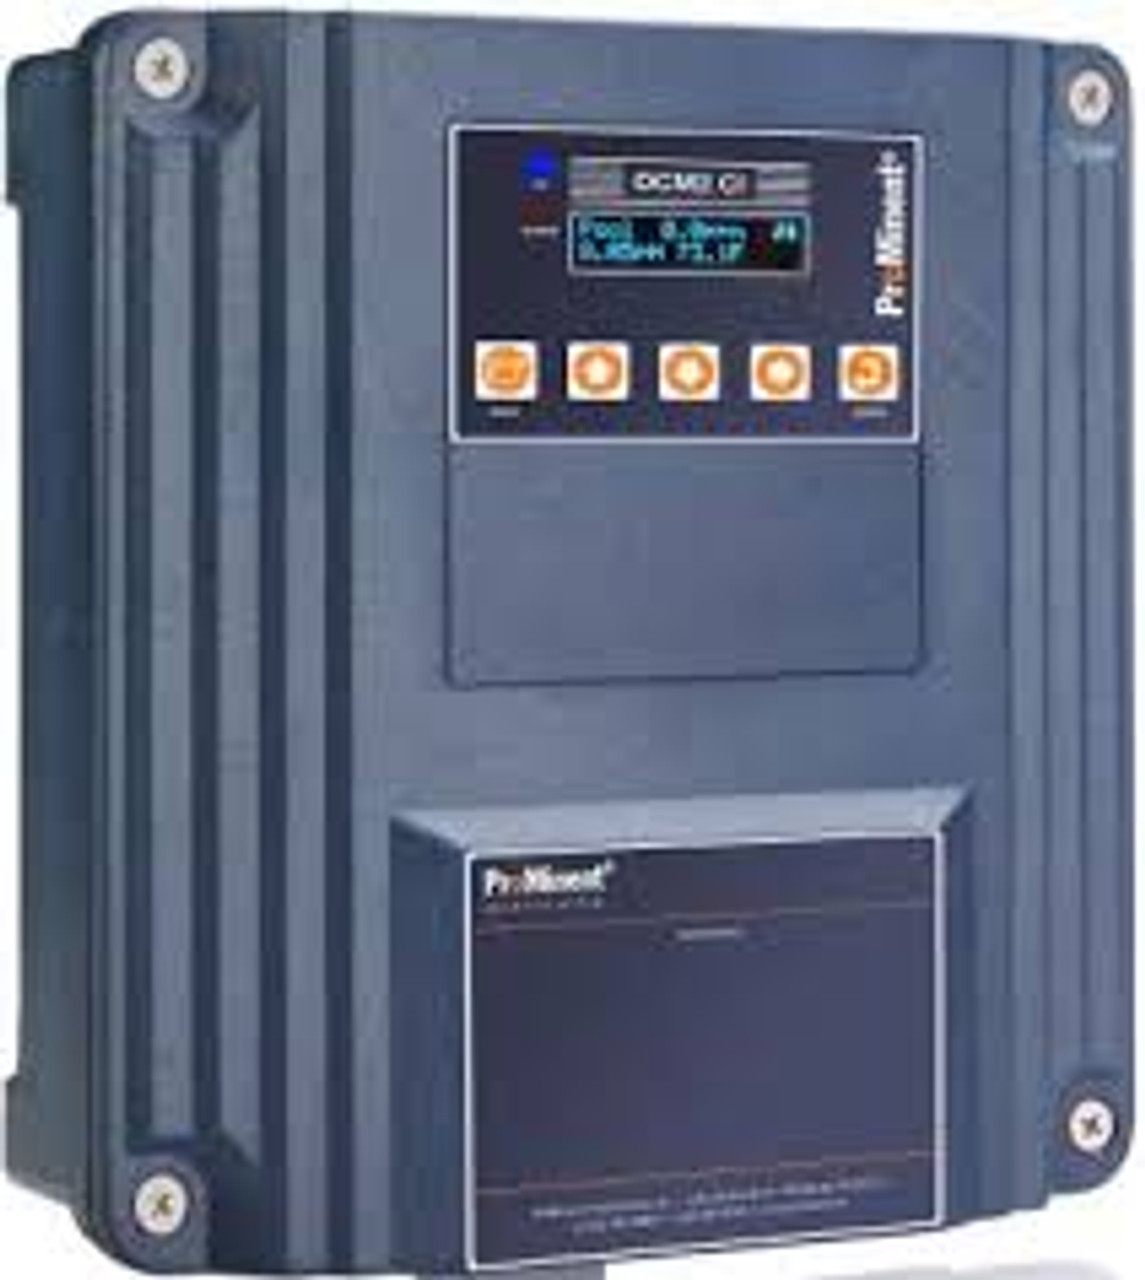 Controller Parts - DCM2 Board